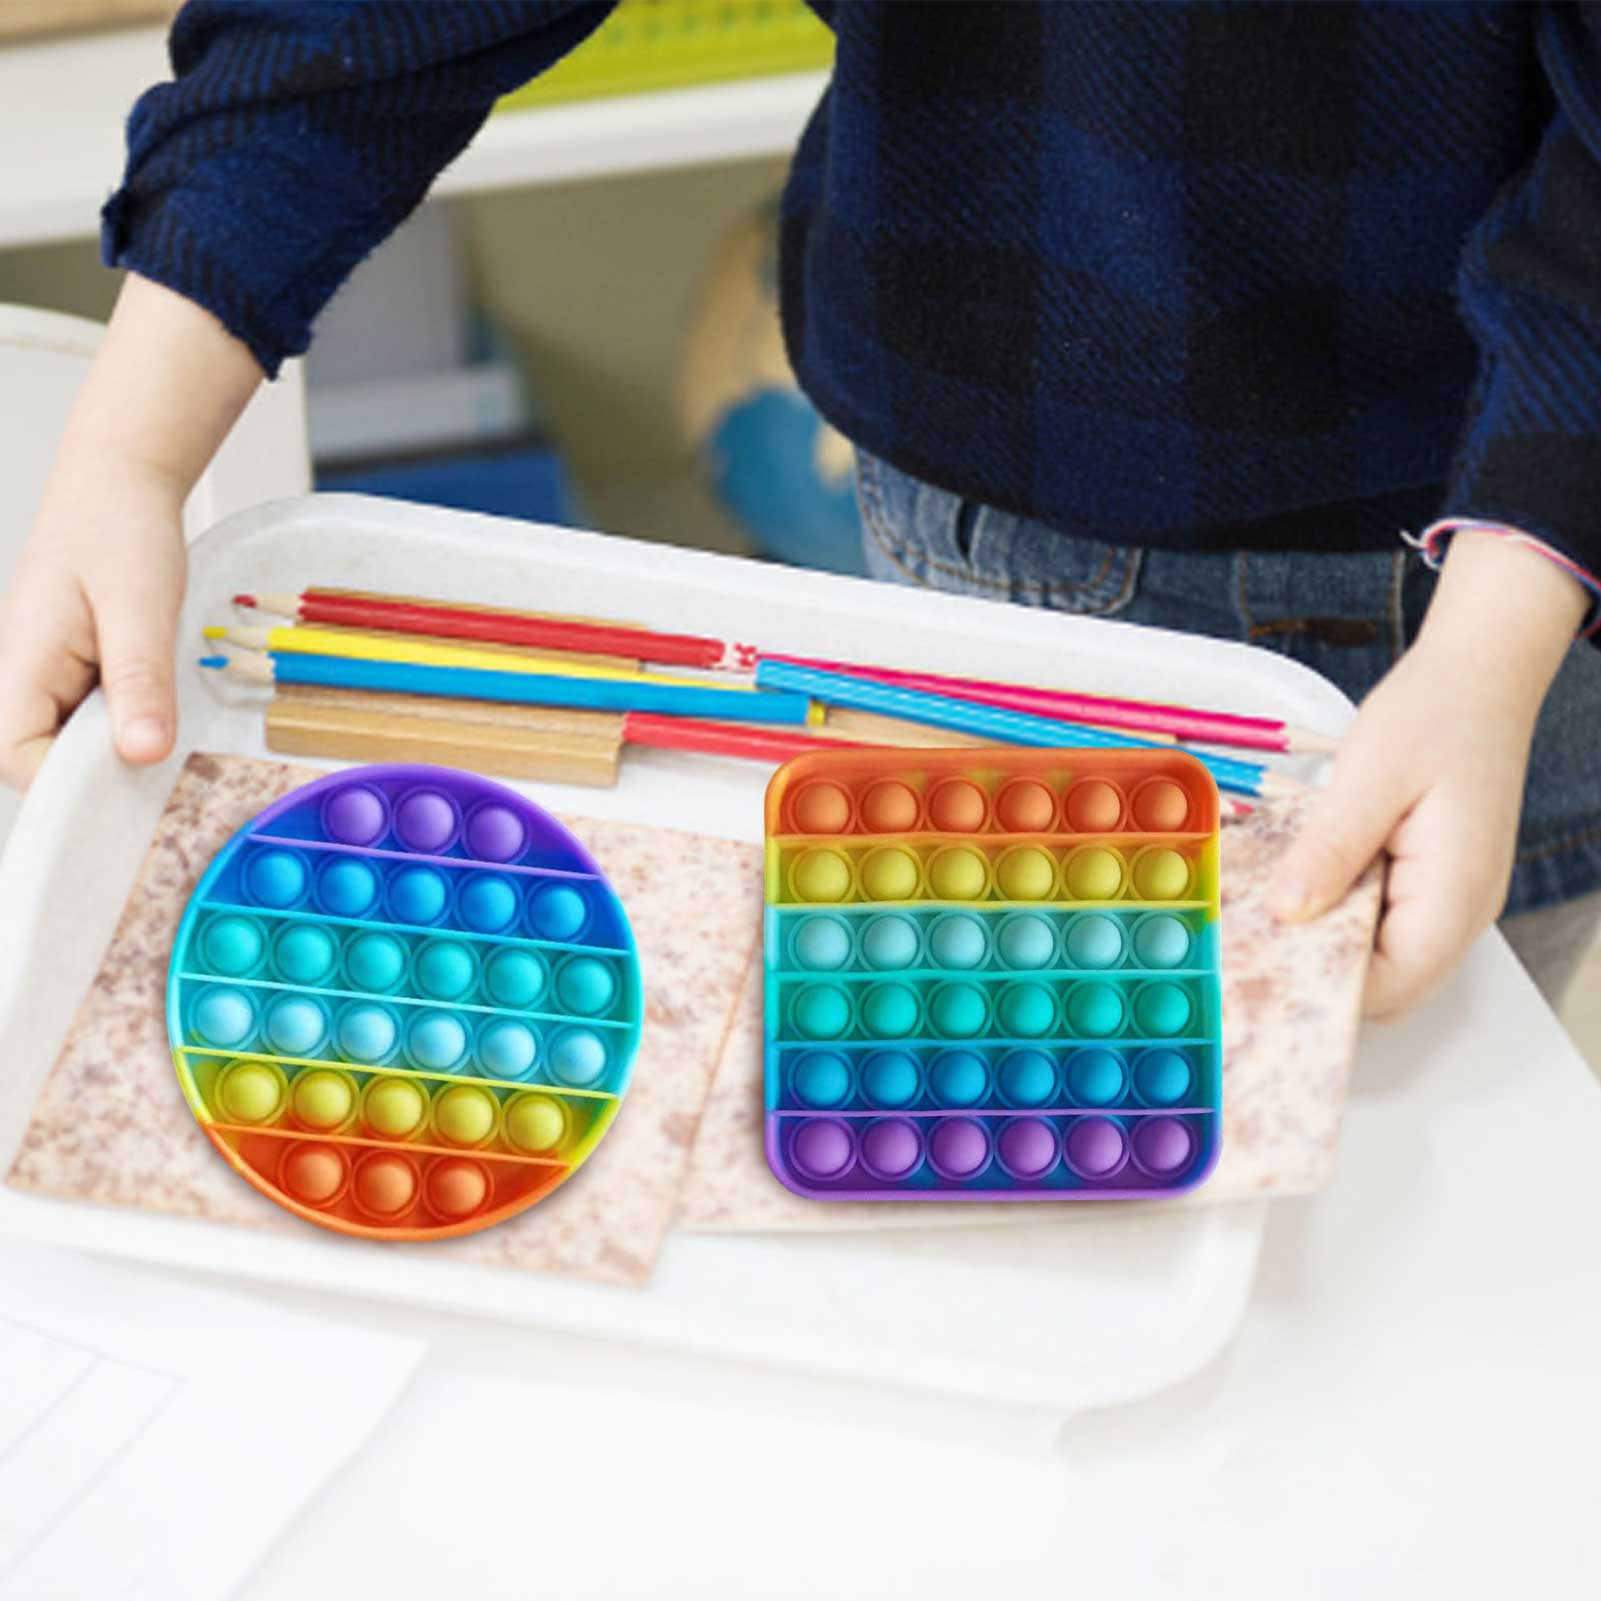 Toys Adult Bubble-Sensory-Toy Fidget-It-Reliver Push-Fidget Needs Anti-Stress Funny Squishy img2